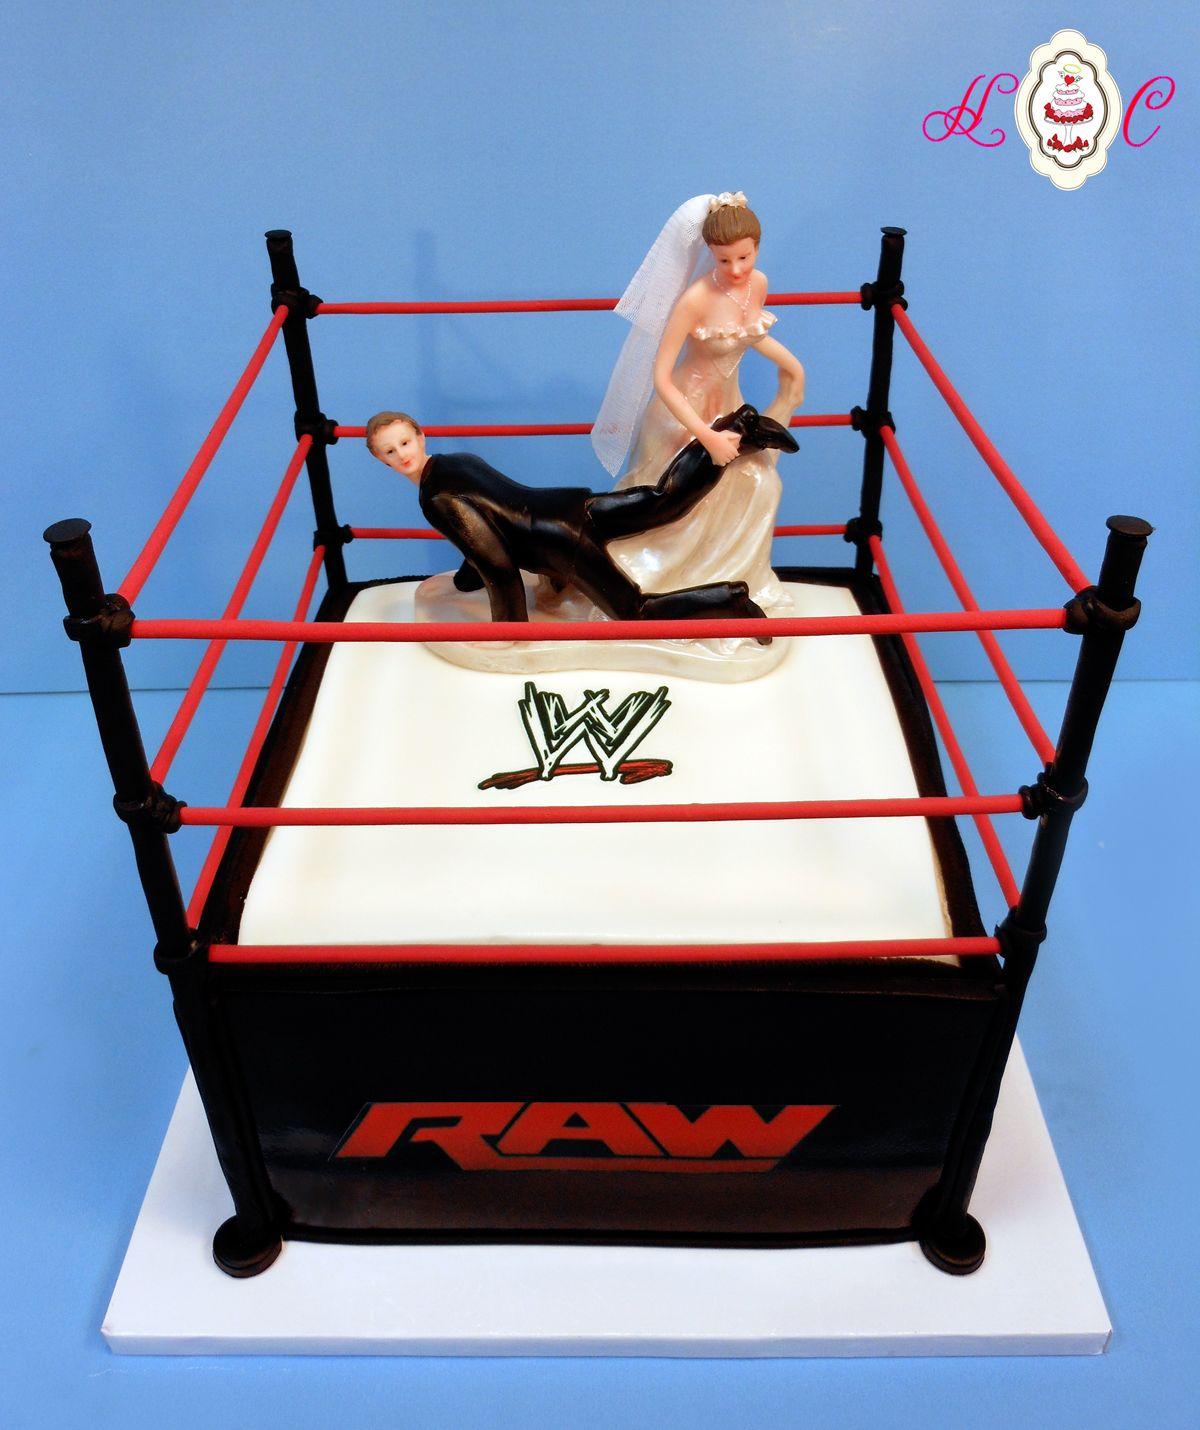 Grooms Wedding Cake Ideas: WWE RAW Wrestling Ring Groom's